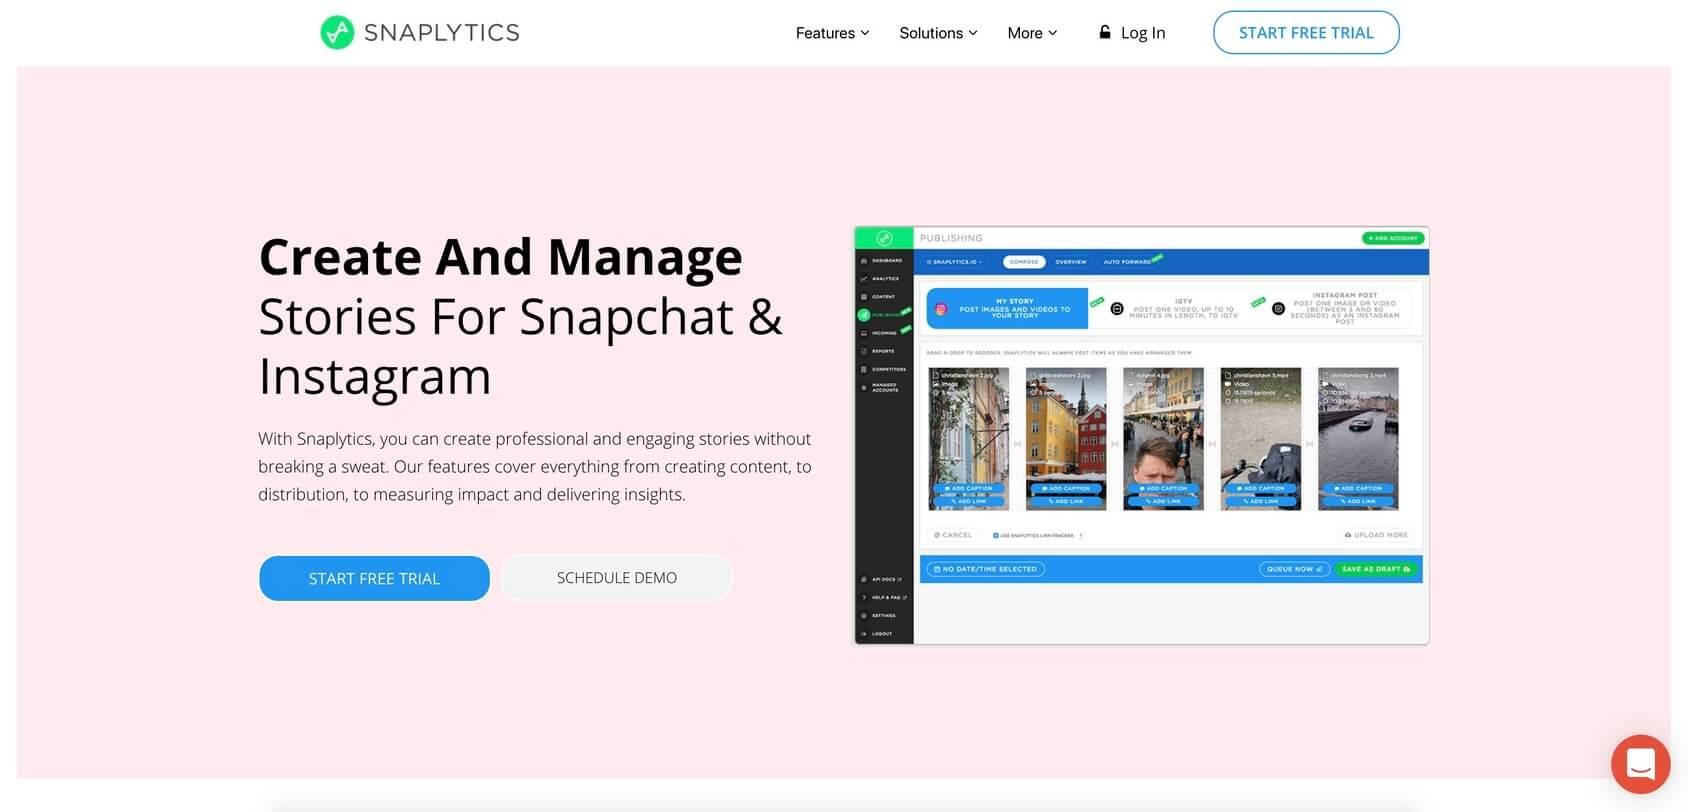 Snaplytics homepage